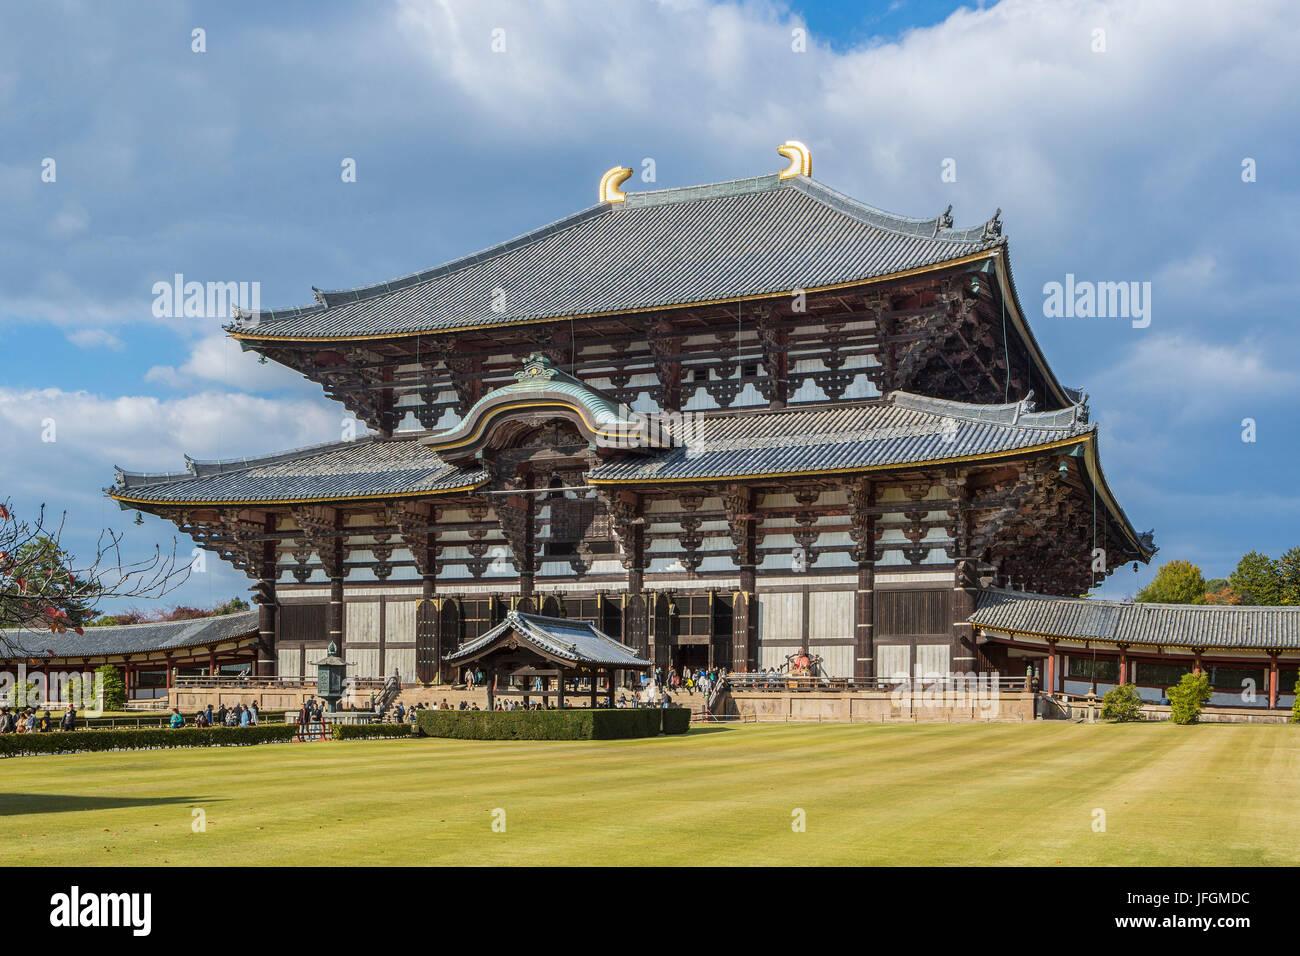 Japan, Kansai, Nara City, Todai-ji Temple, UNESCO World Heritage, - Stock Image